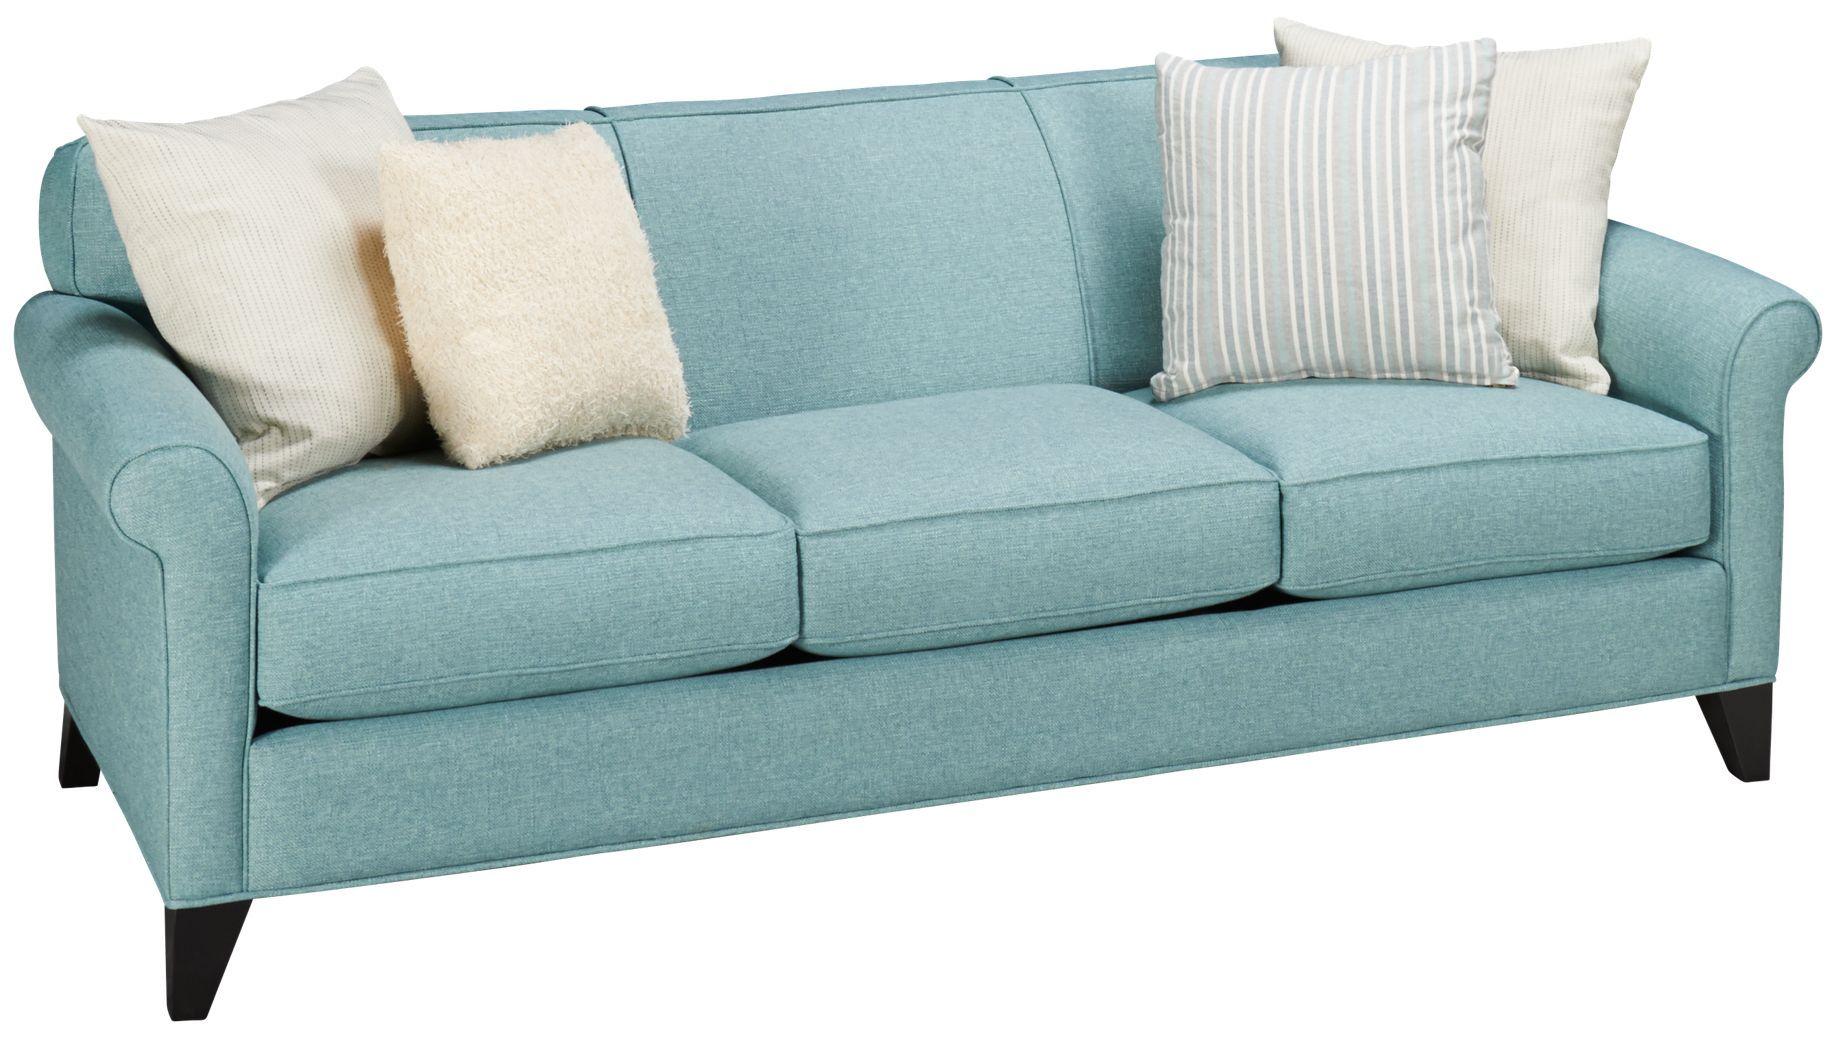 Jonathan louis furniture reviews affordable full size of for Affordable furniture company reviews